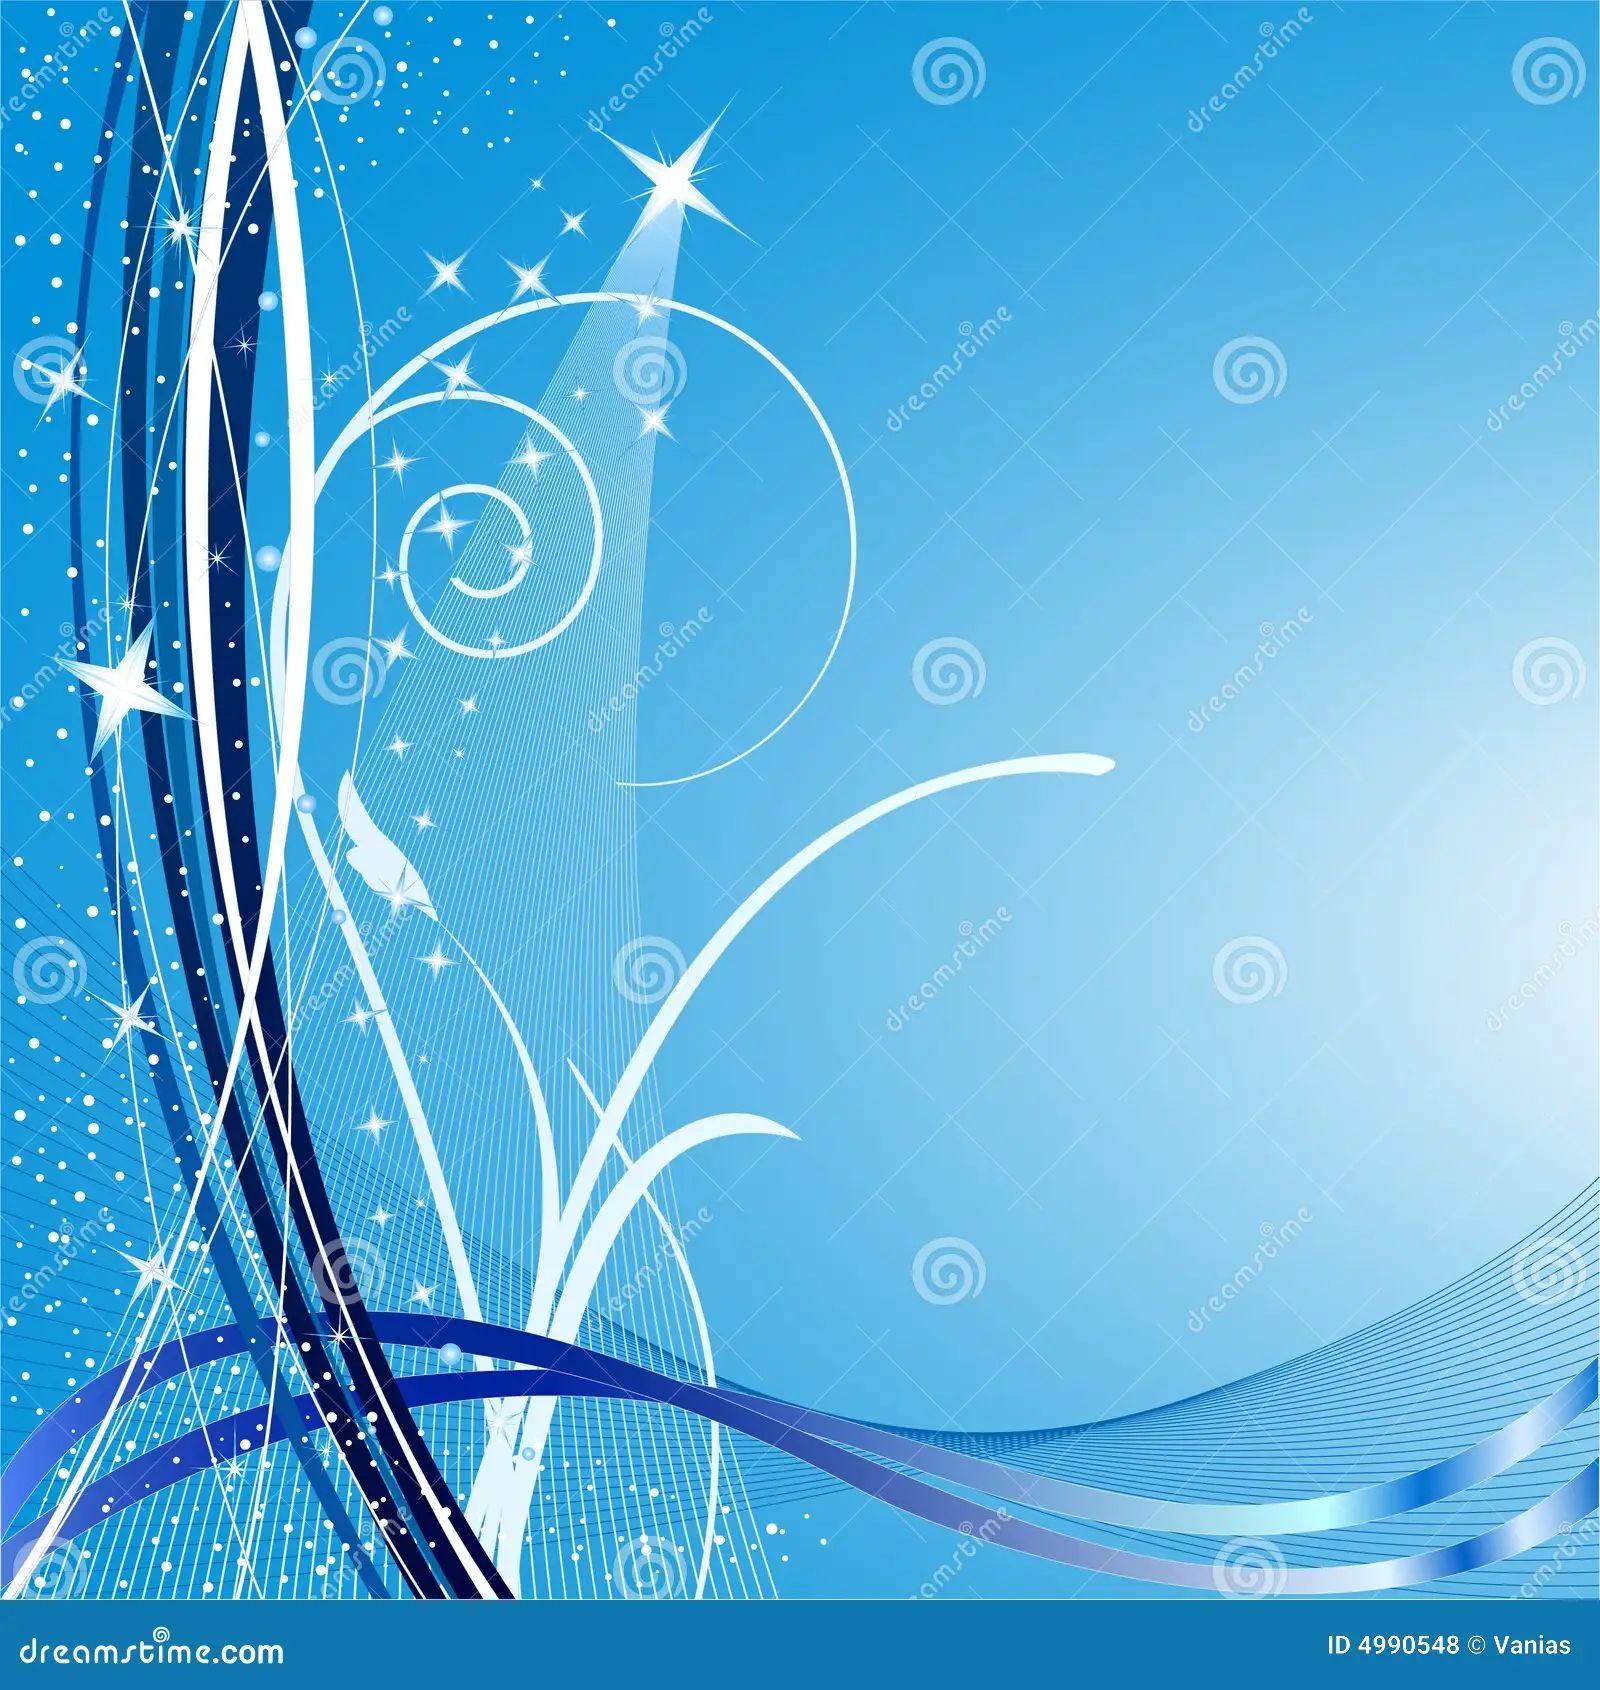 blue artistic backgrounds